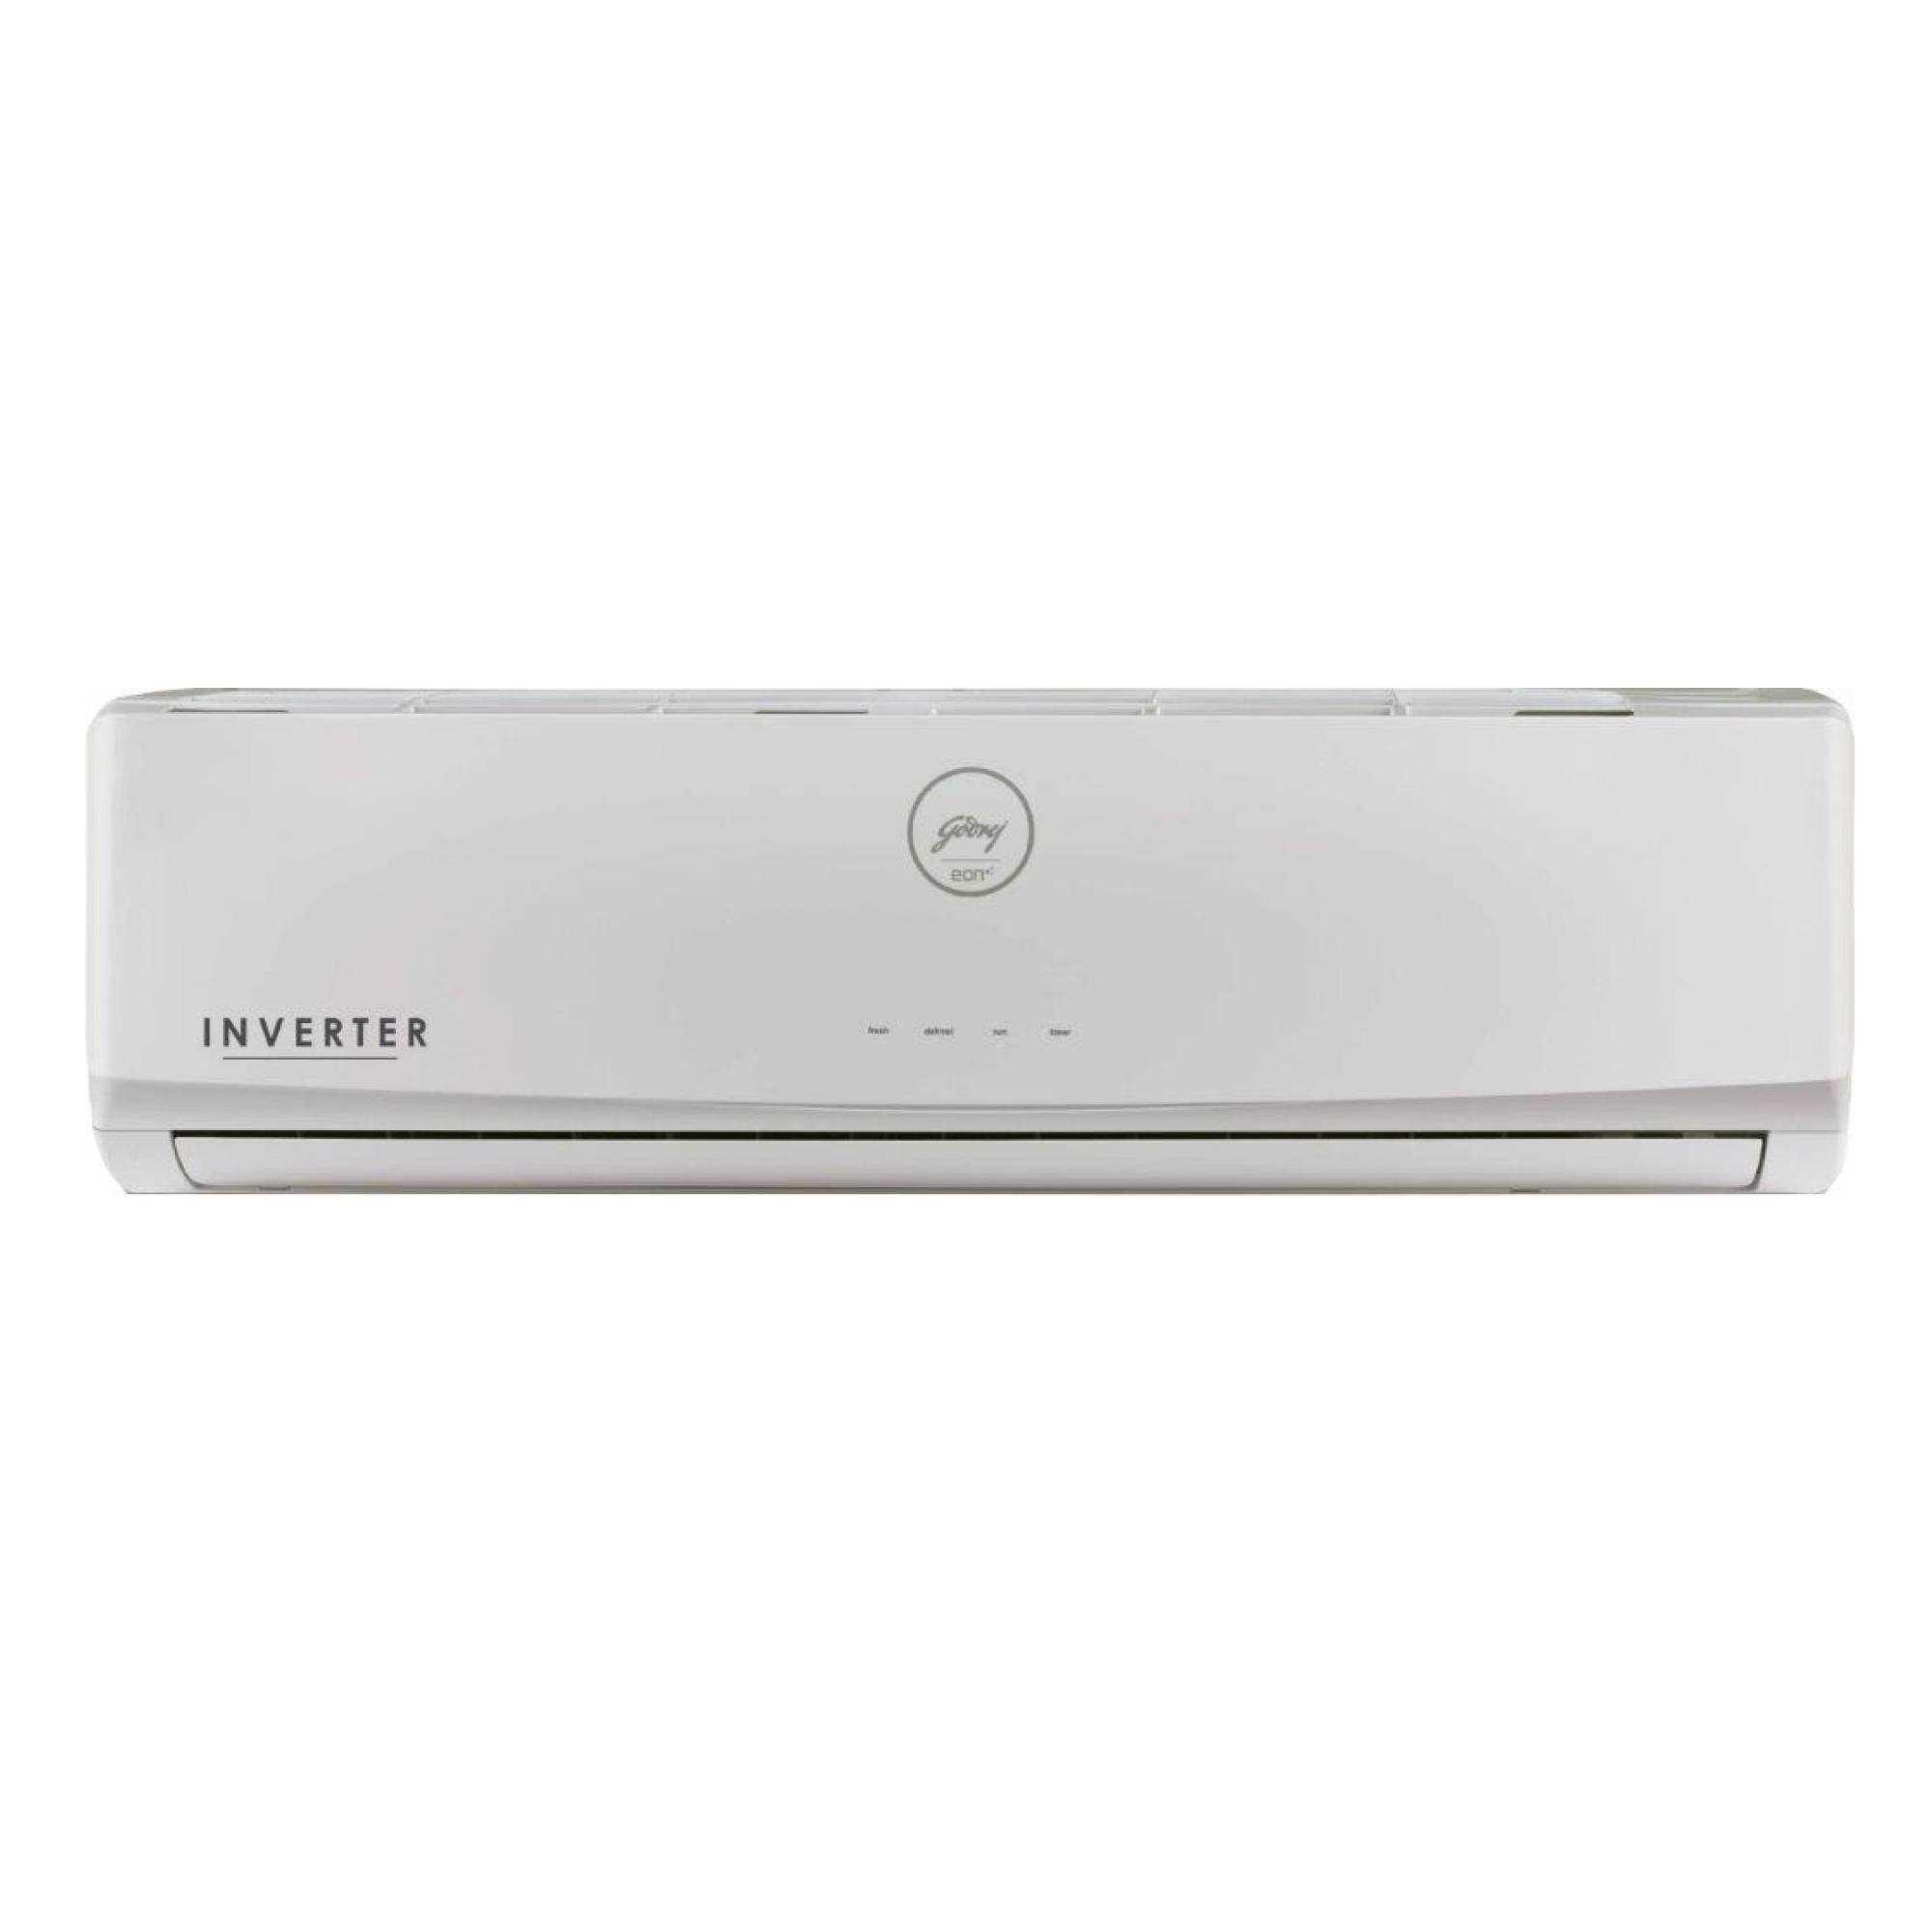 Godrej Inverter Air Conditioner Pictures